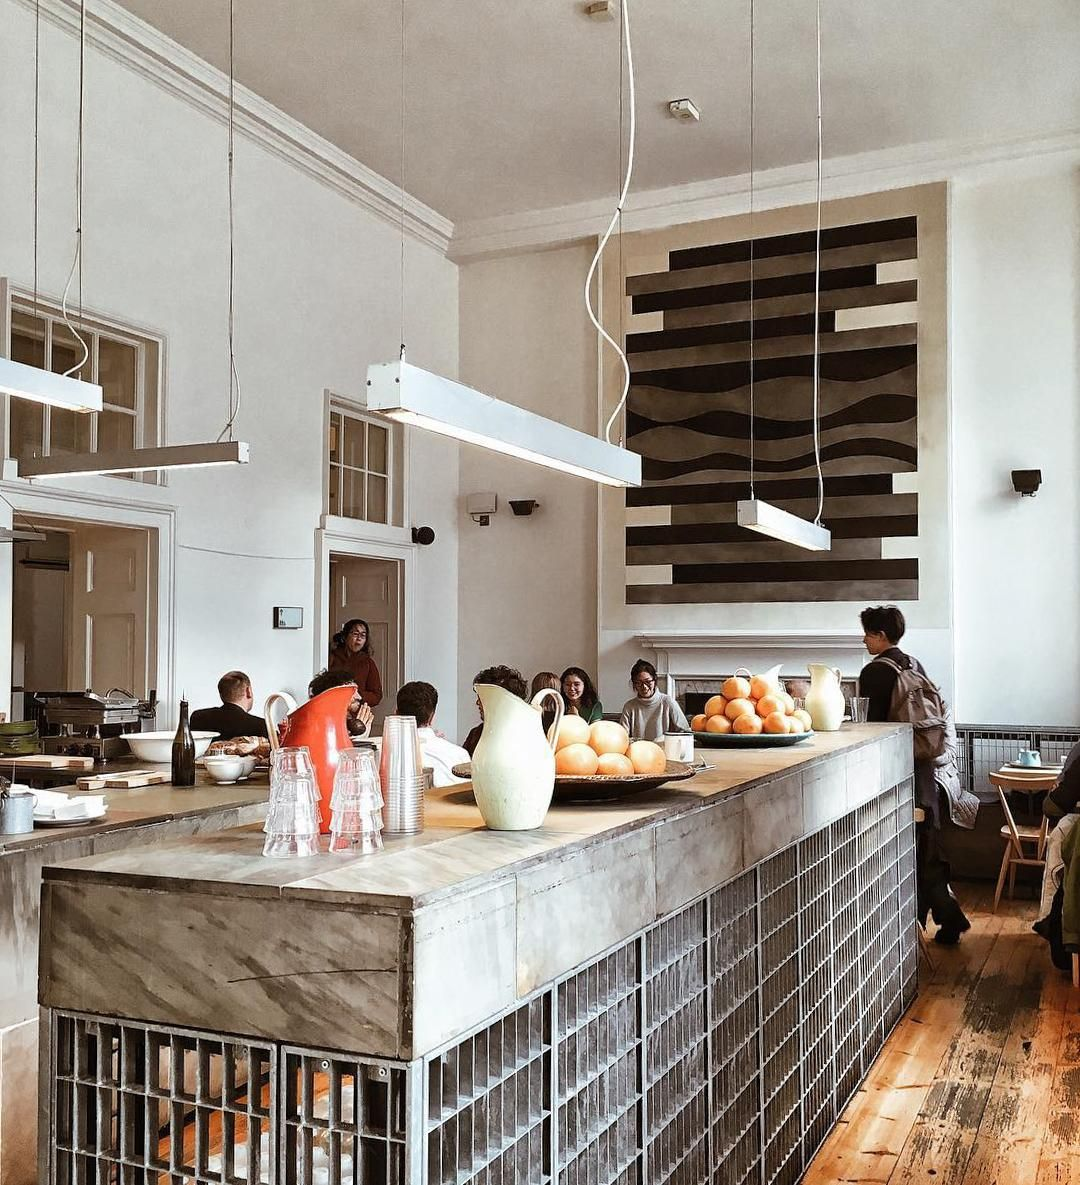 25 of londons most buzzworthy coffee shops coffee shop